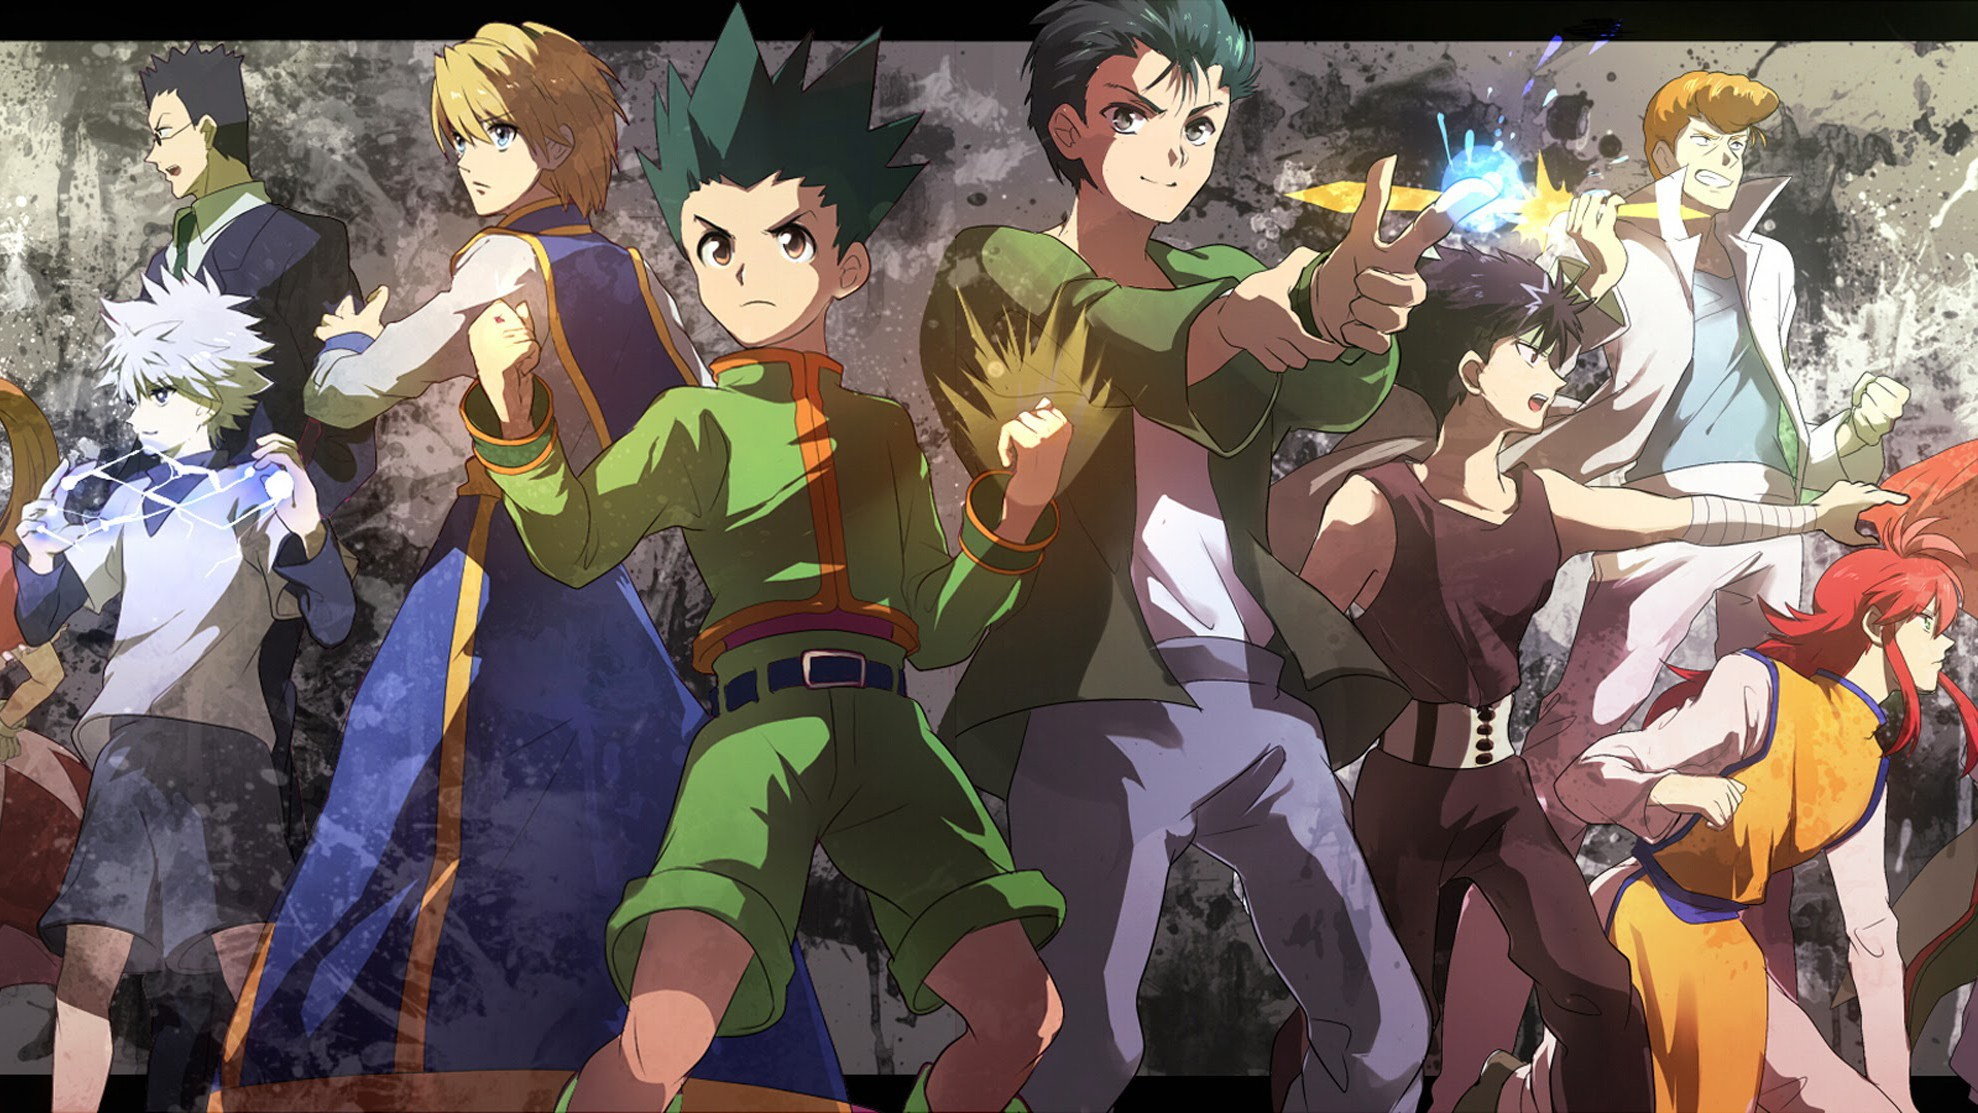 Yu Yu Hakusho Hunter X Hunter Crossover 1080p Hd Wallpaper Yu Yu